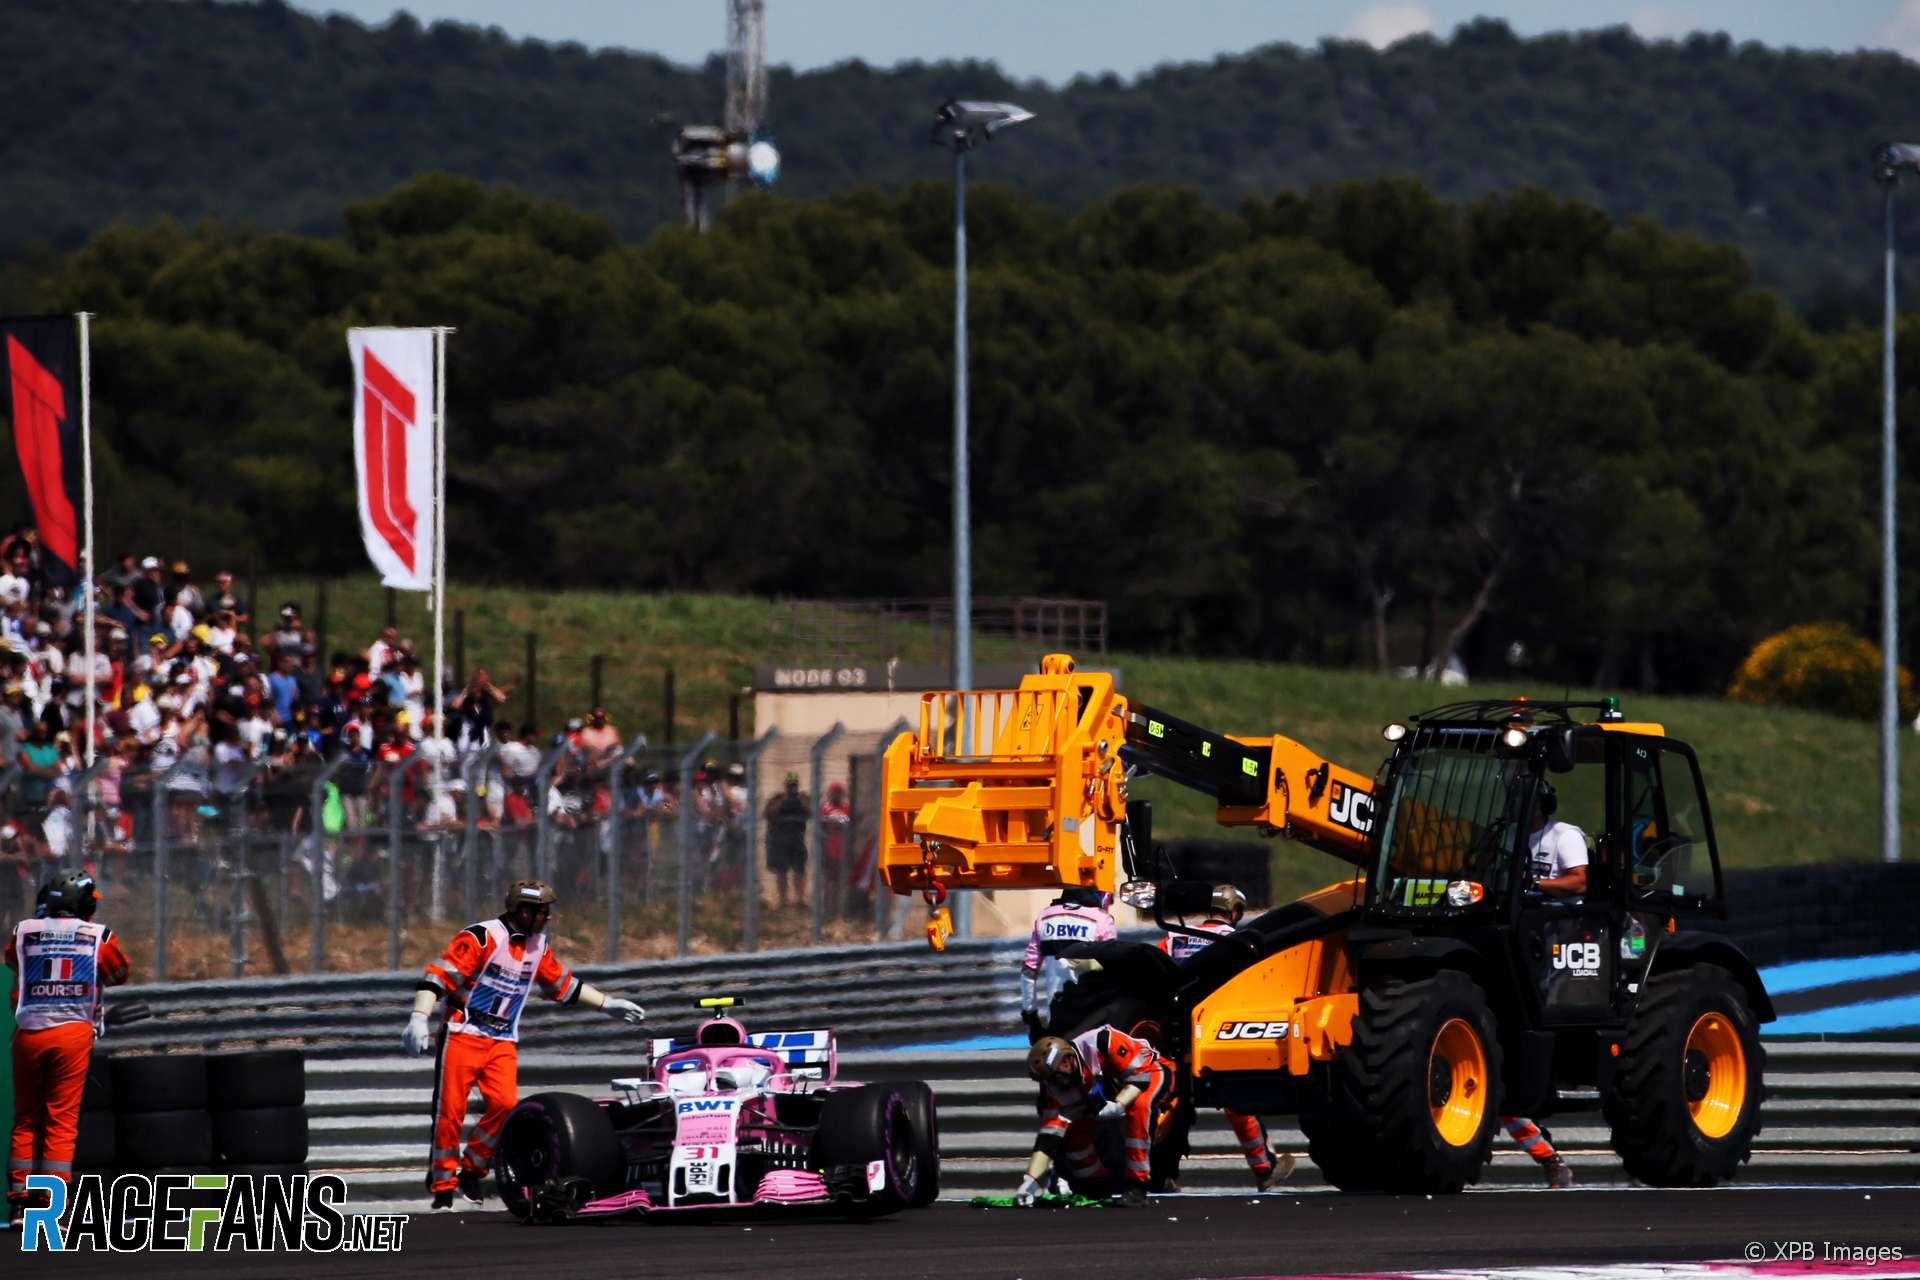 Esteban Ocon, Force India, Paul Ricard, 2018